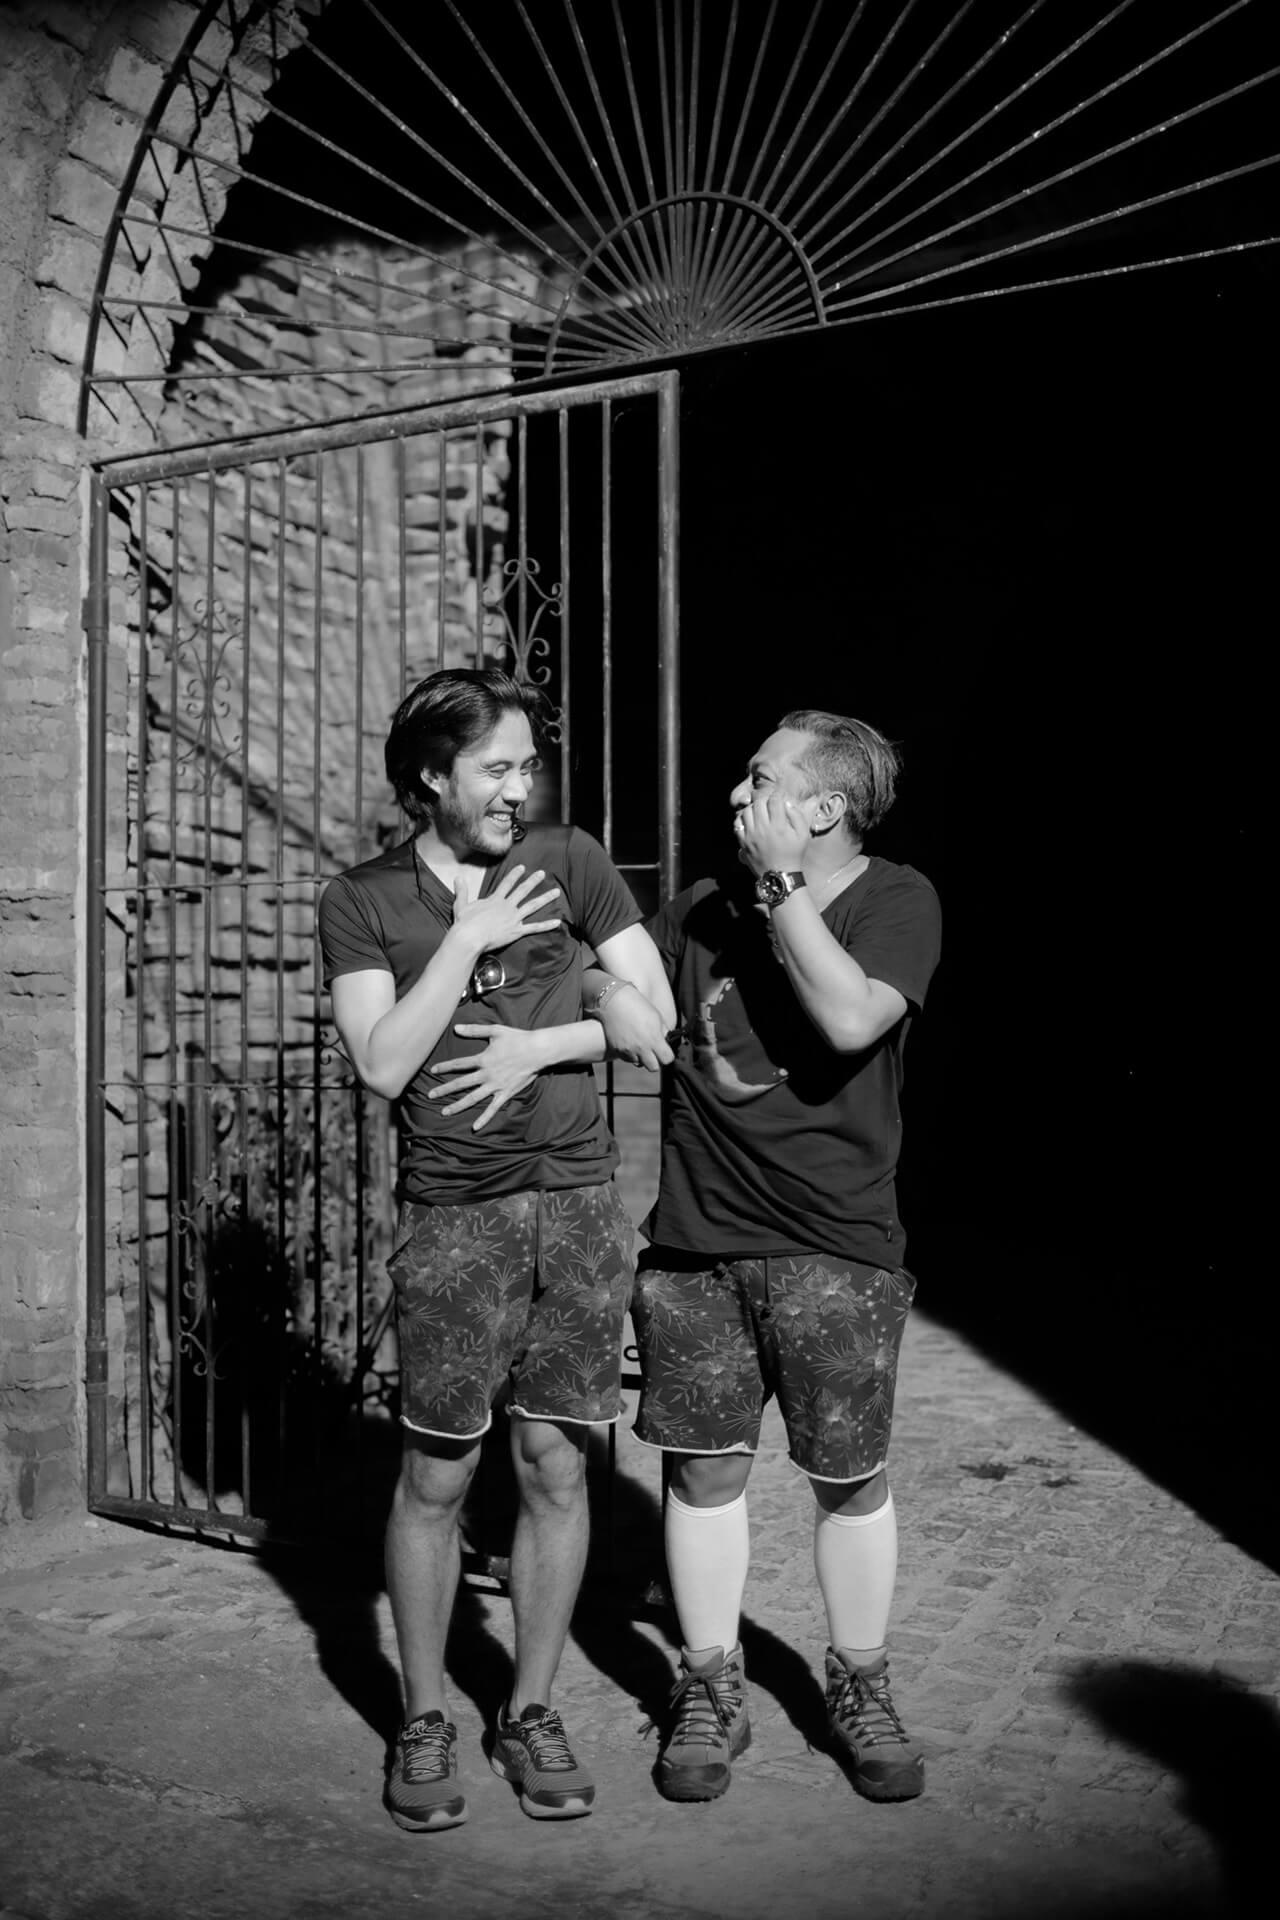 Lexter Tarriela (right) joking around with Rafa Siguion-Reyna (left)